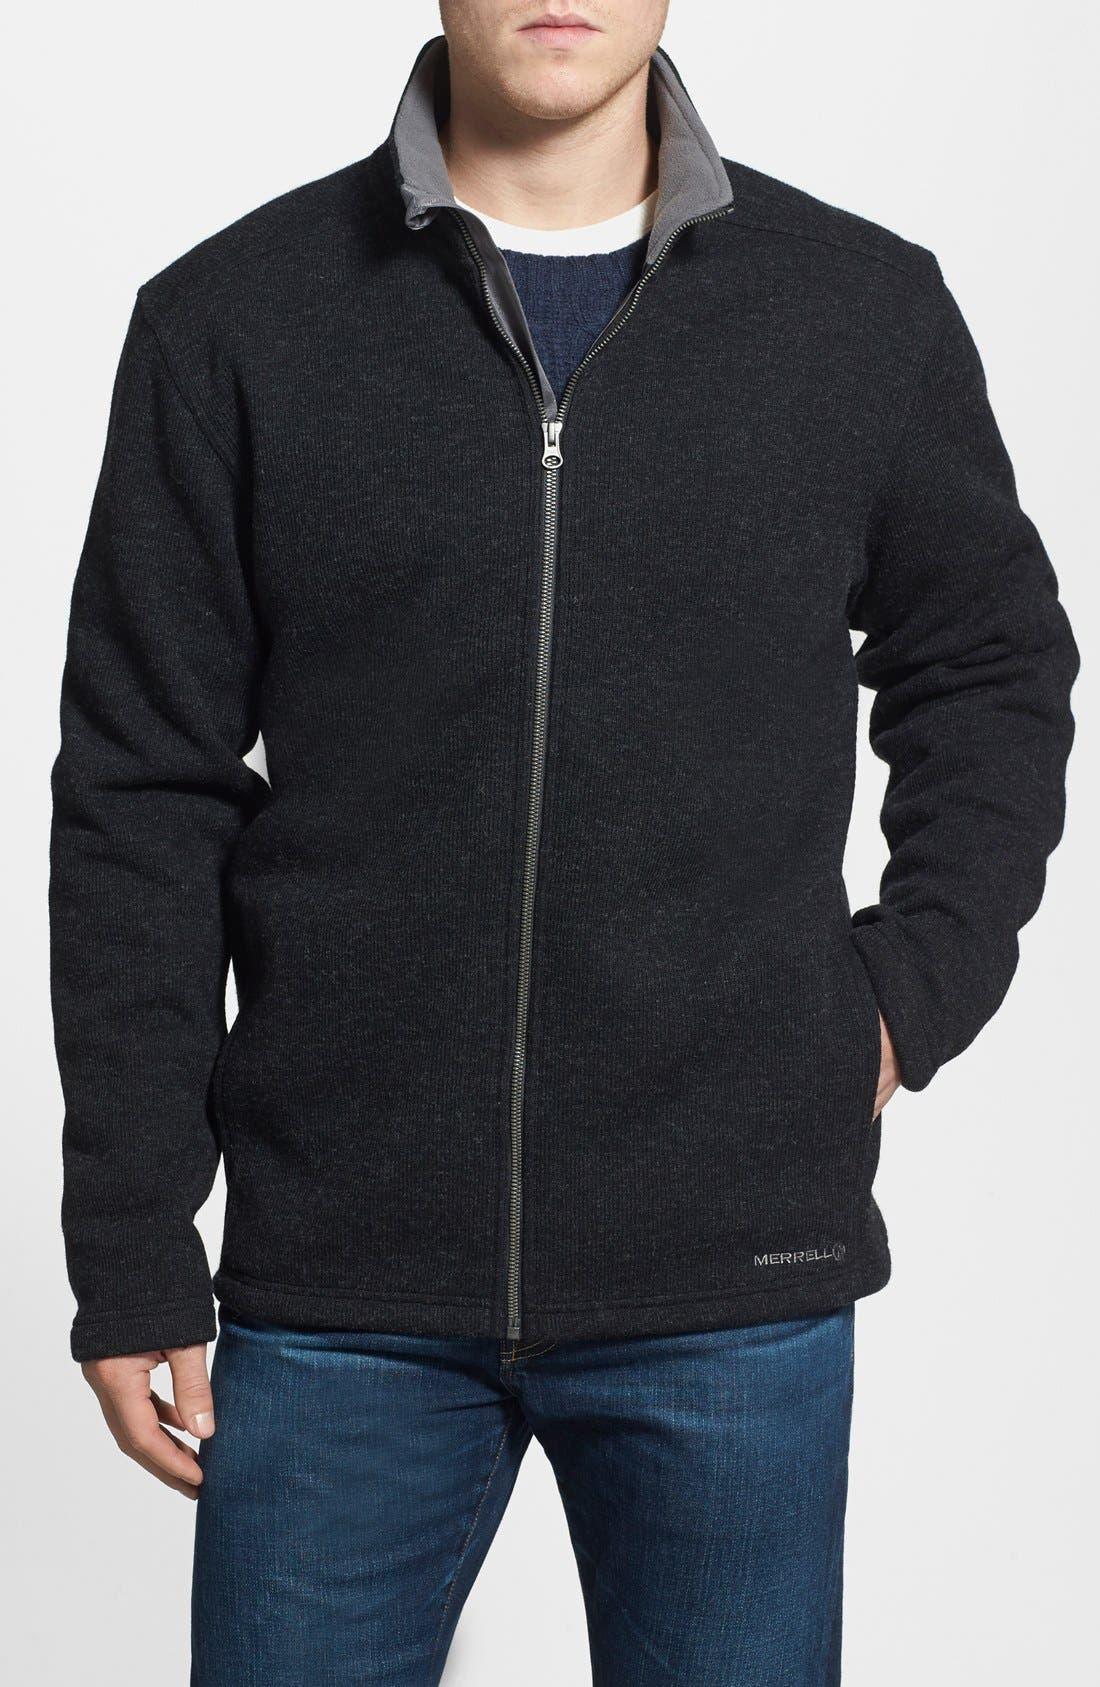 Main Image - Merrell 'Big Sky' Fleece Knit Jacket (Online Only)